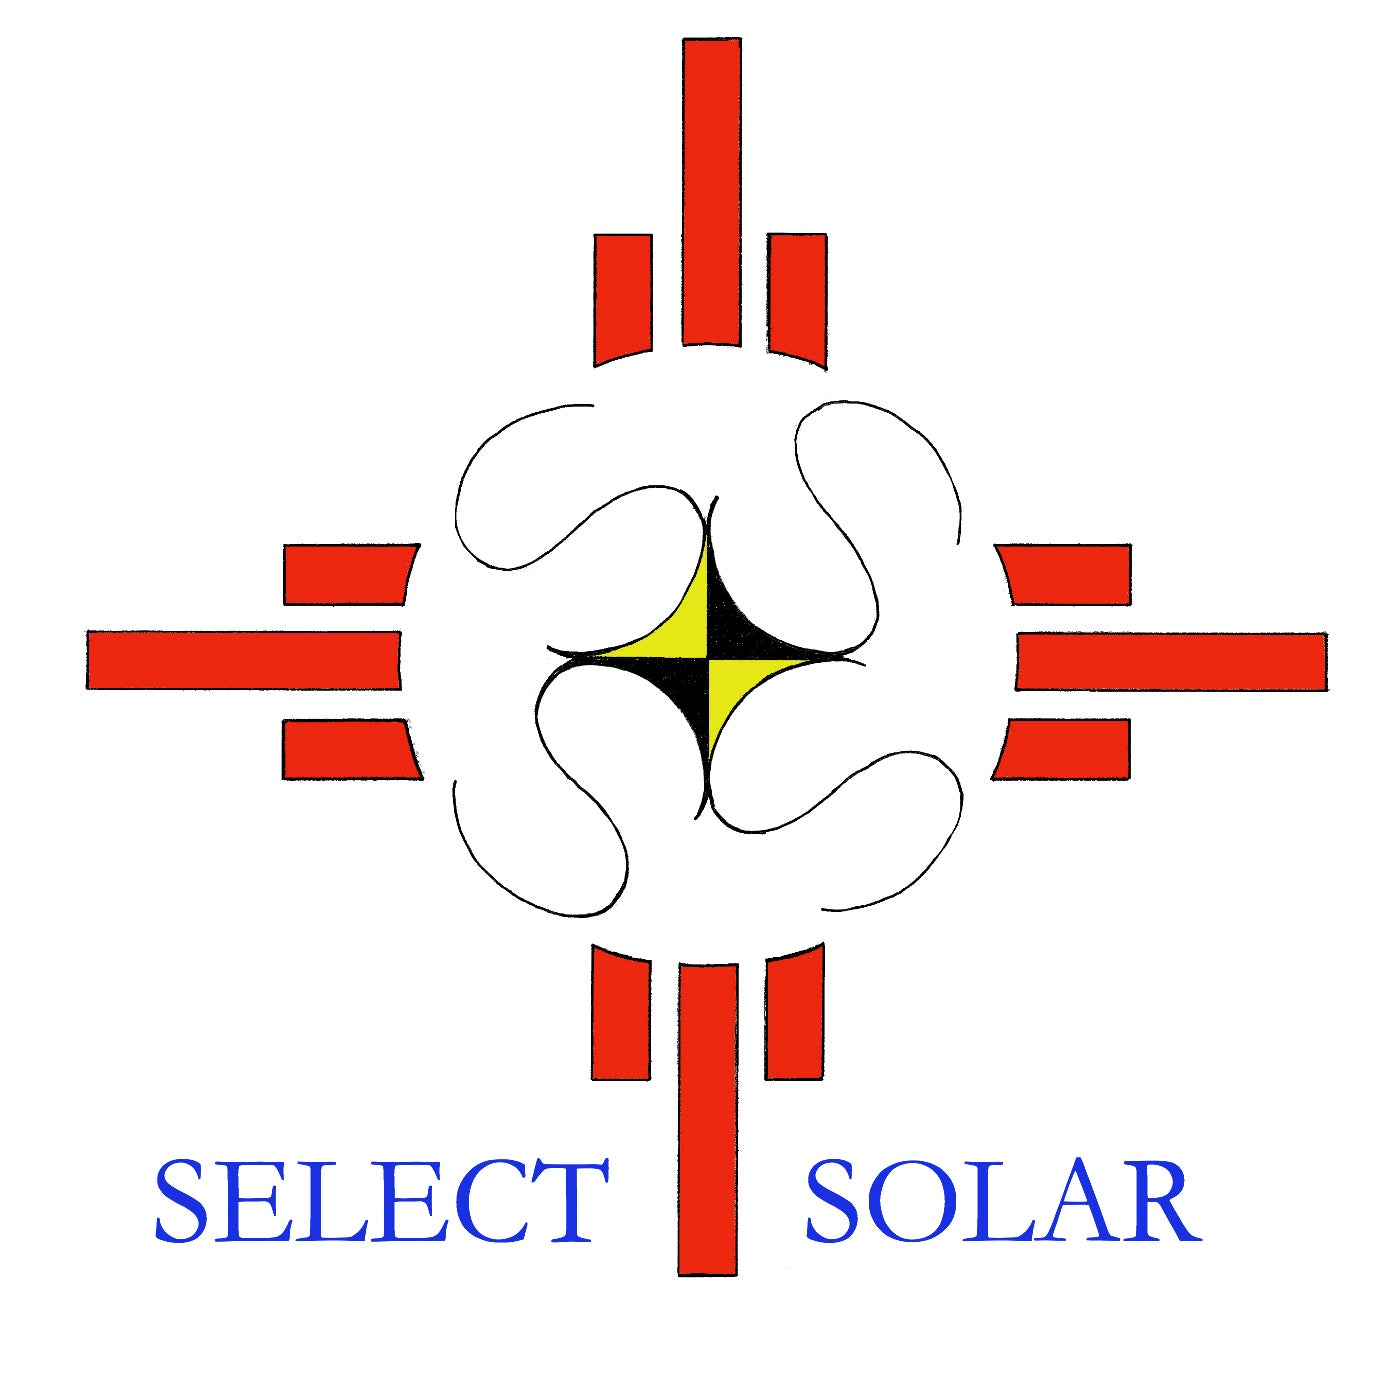 Vivint solar reviews california - Select Solar Llc Reviews Select Solar Llc Cost Select Solar Llc Solar Panels Locations And Complaints